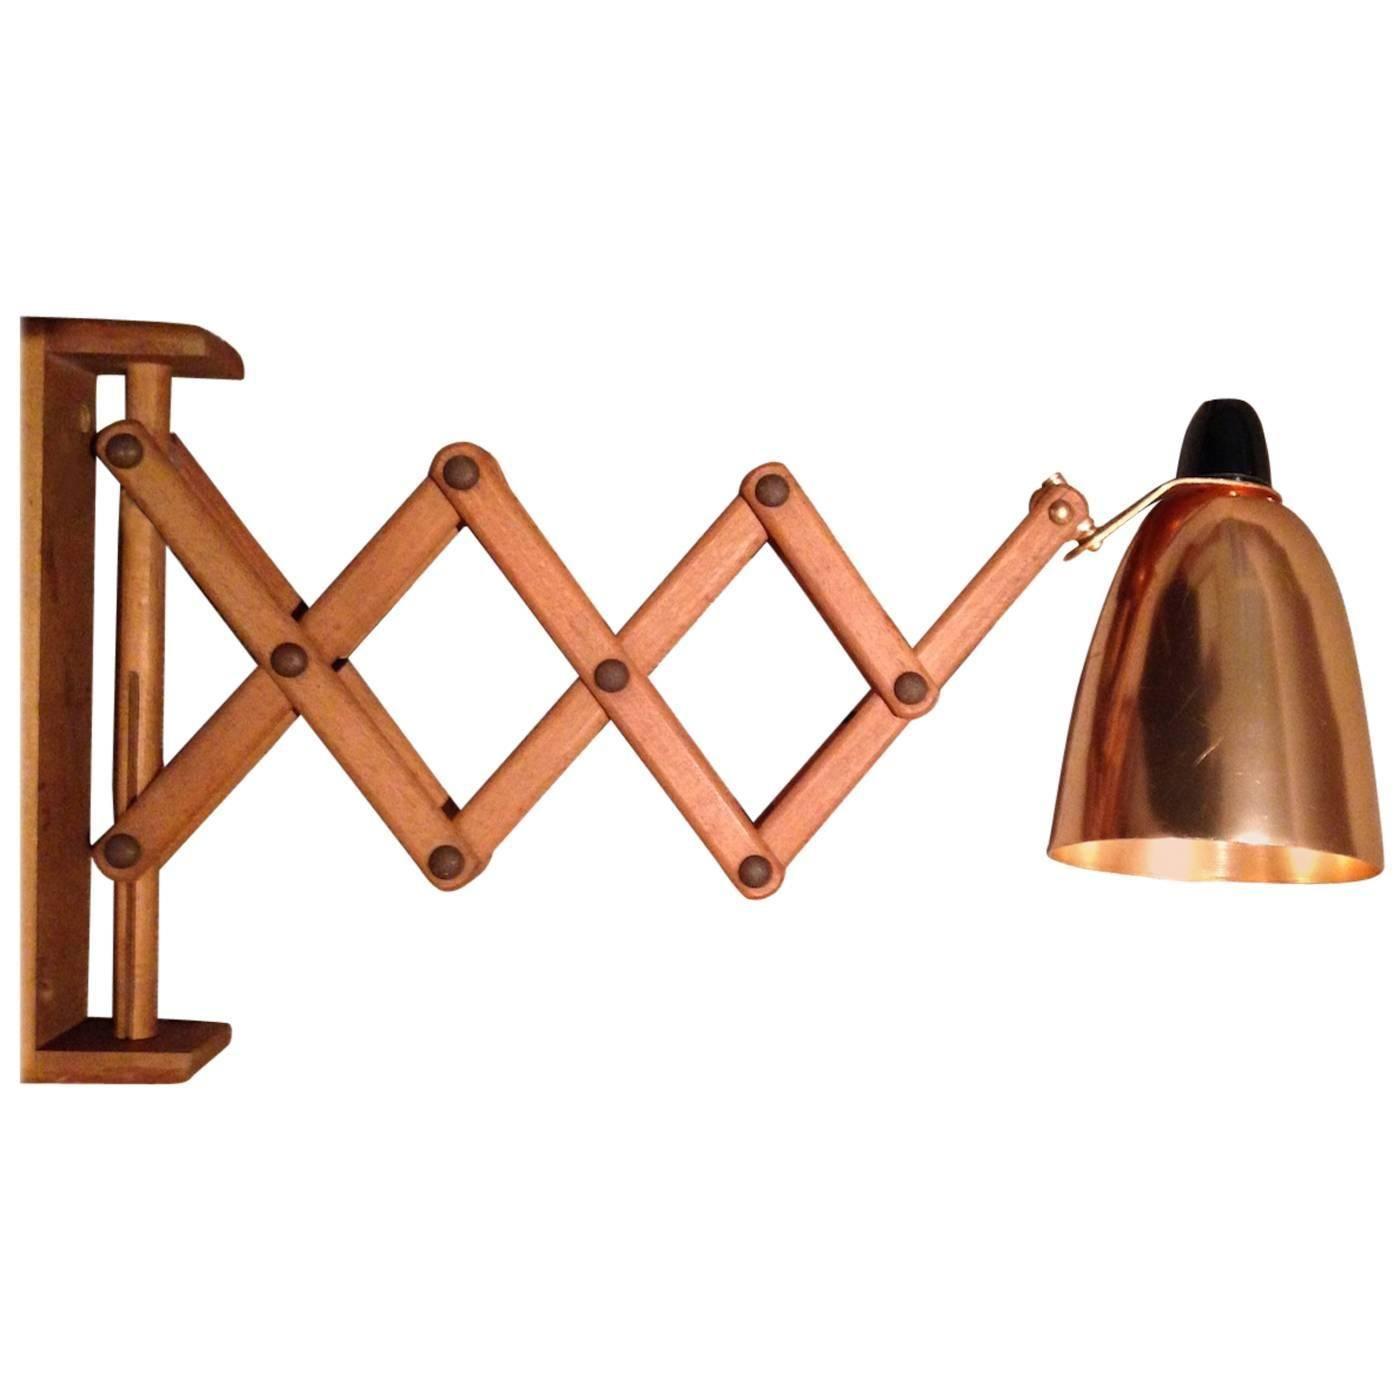 Rare Terence Conran 1950s Copper Wall Lamp 1stdibs Com Wall Lights Copper Wall Vintage Wall Lights